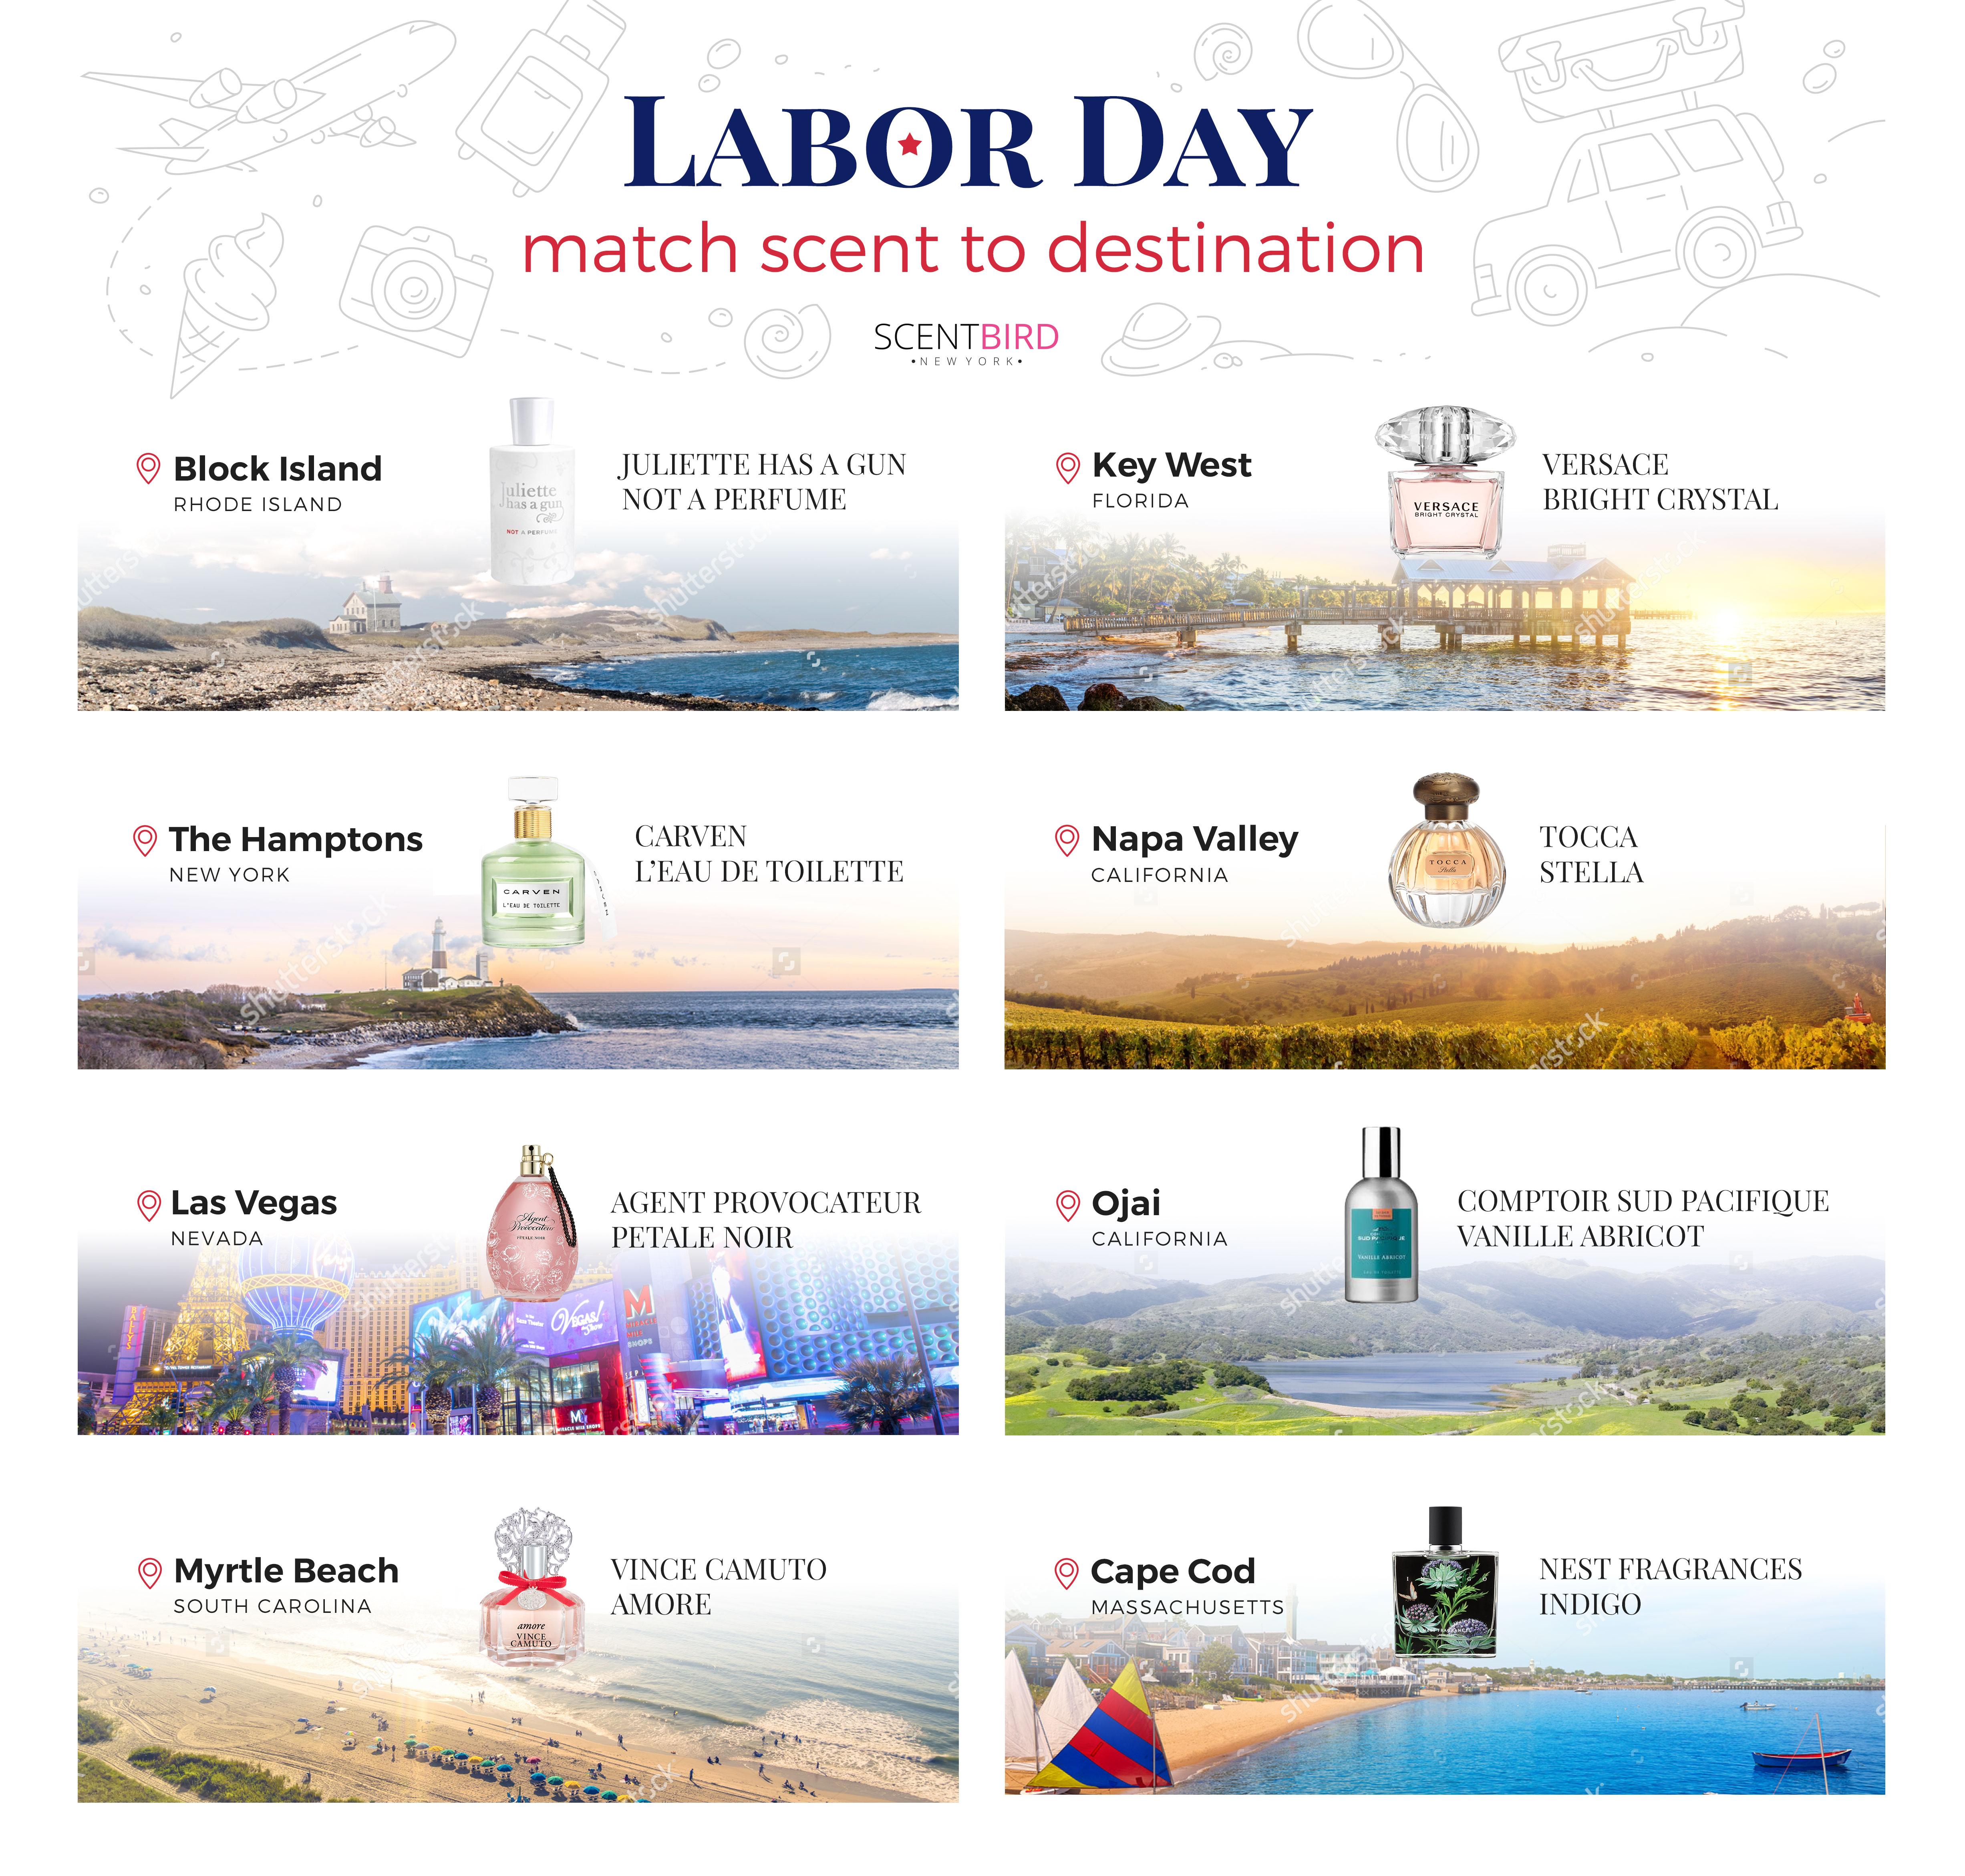 labor day perfume scentbird